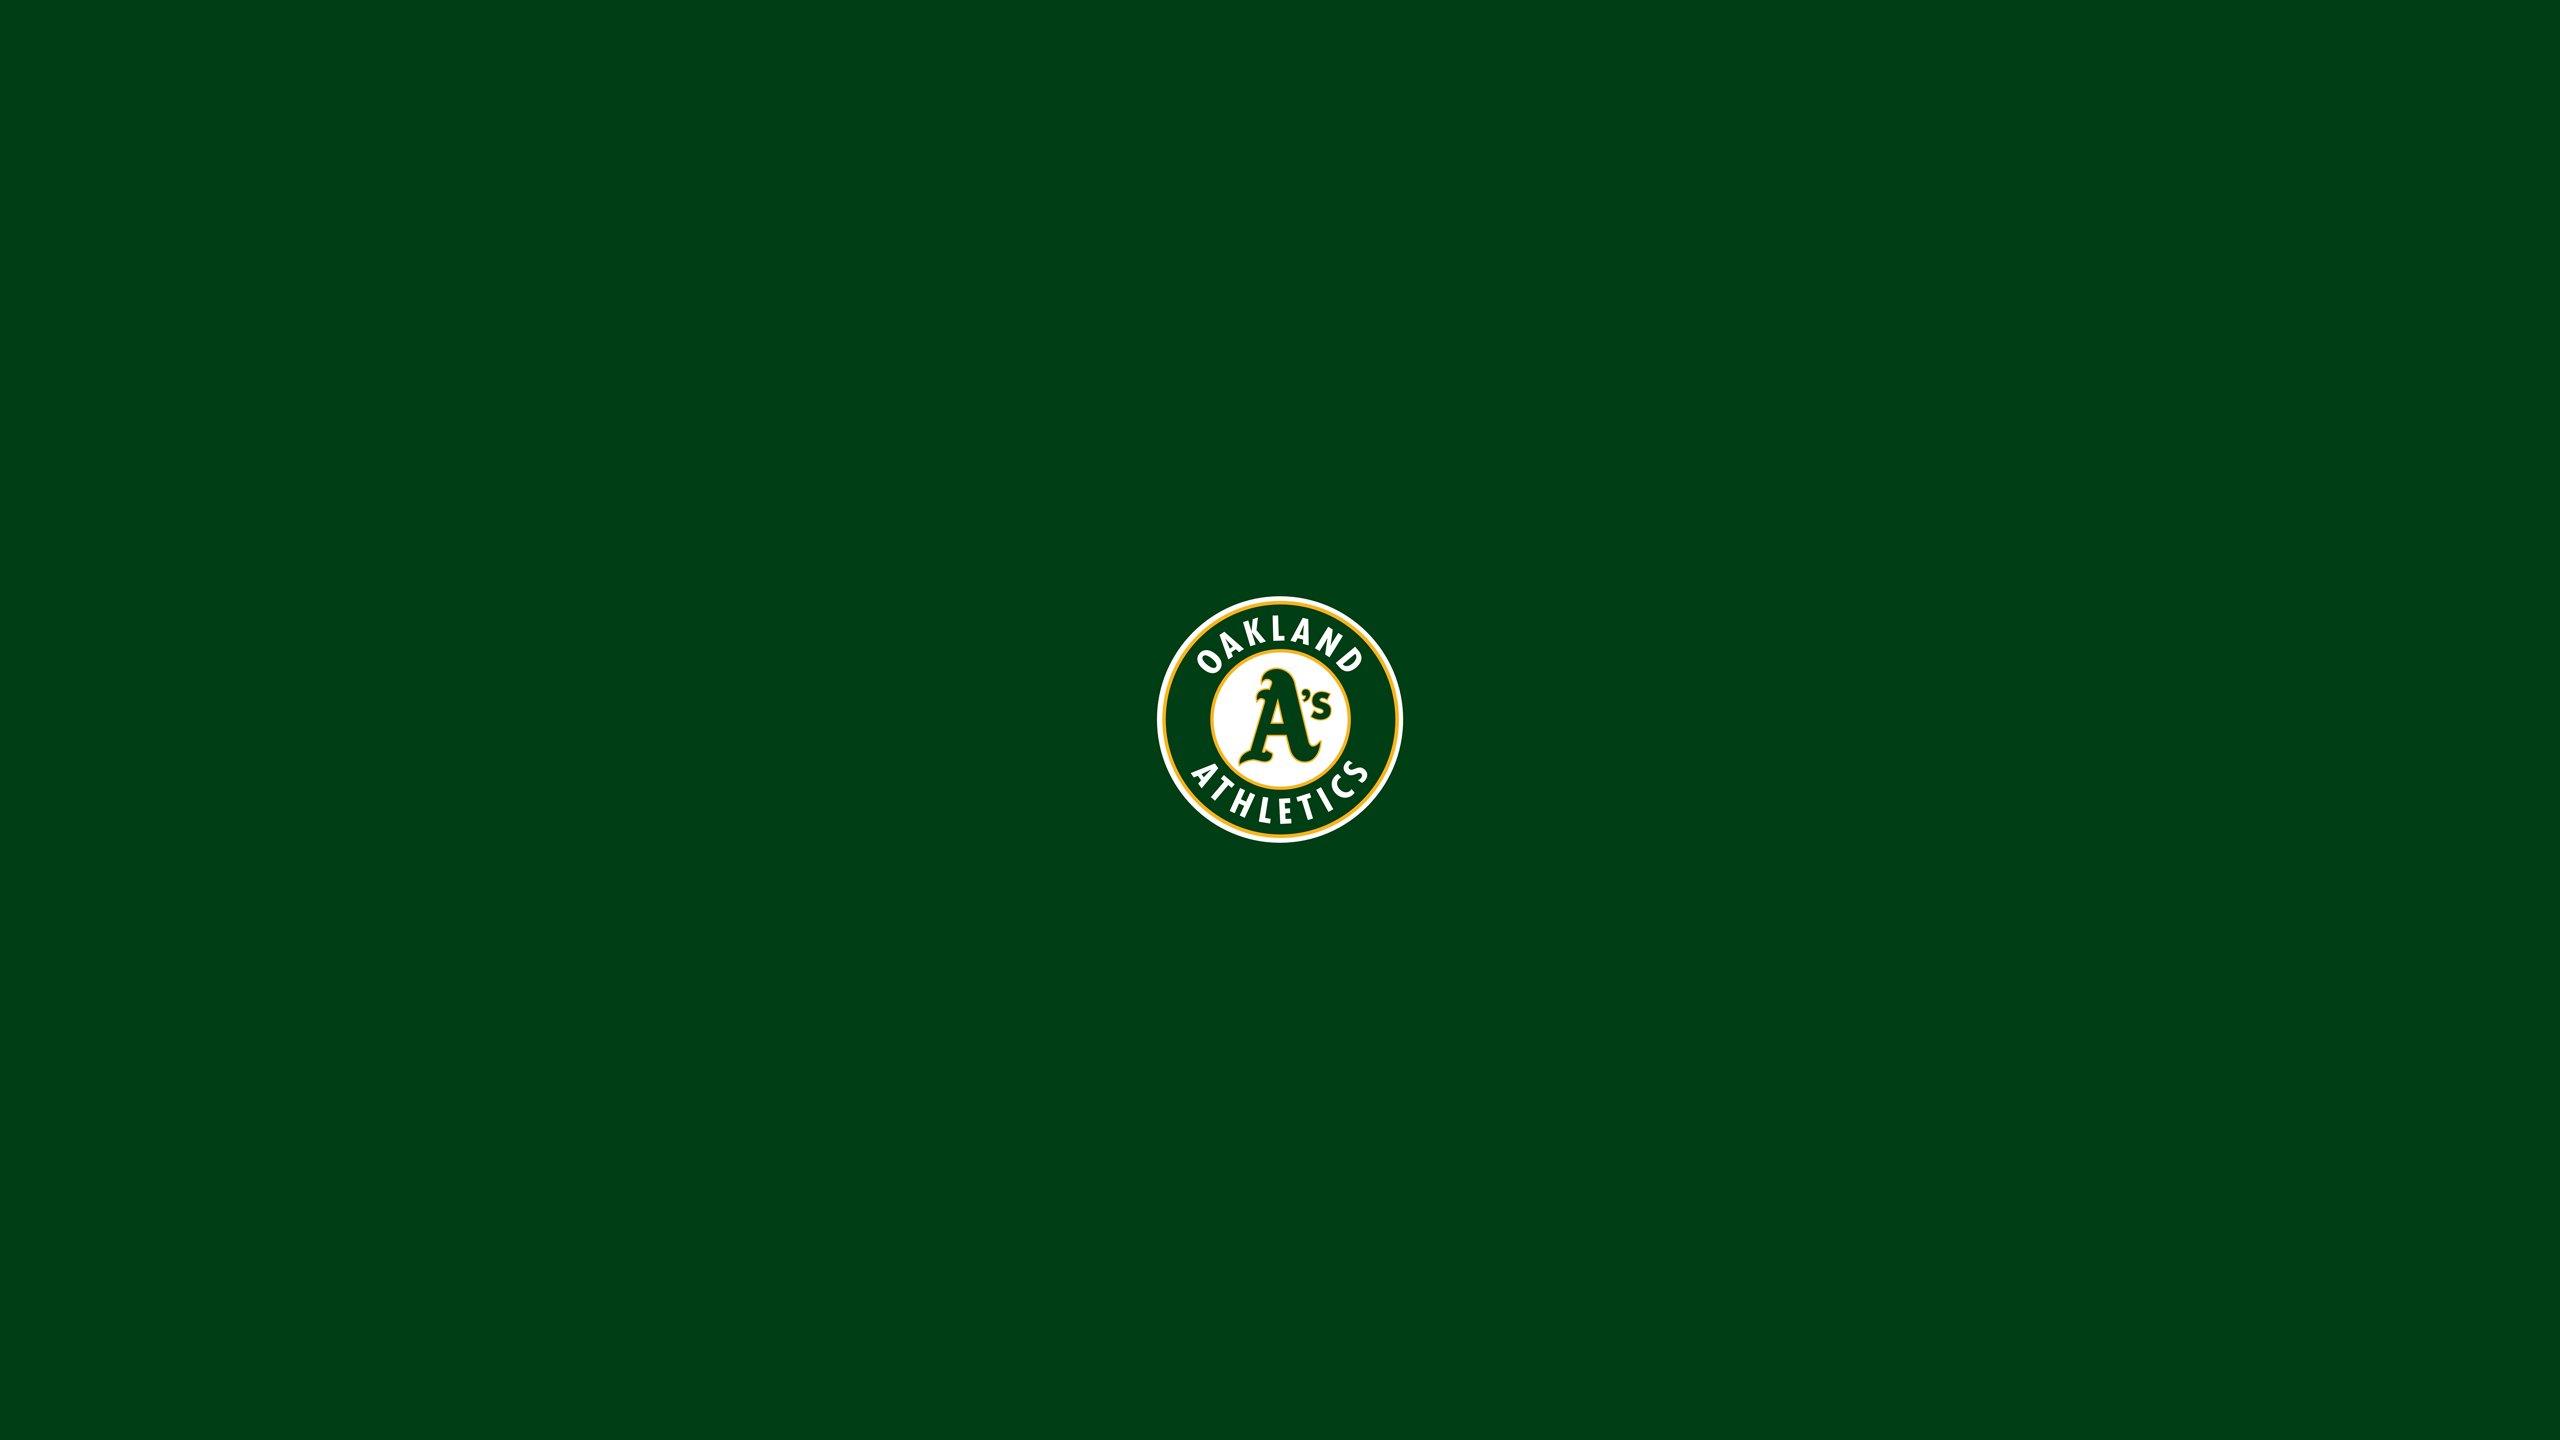 OAKLAND ATHLETICS mlb baseball 50 wallpaper background 2560x1440